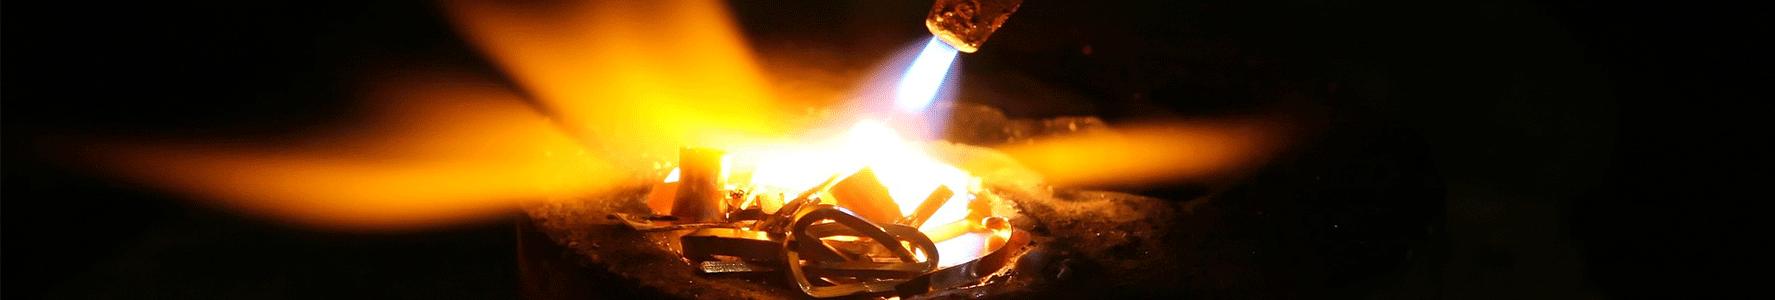 fiamma ossidrica lavora metalli